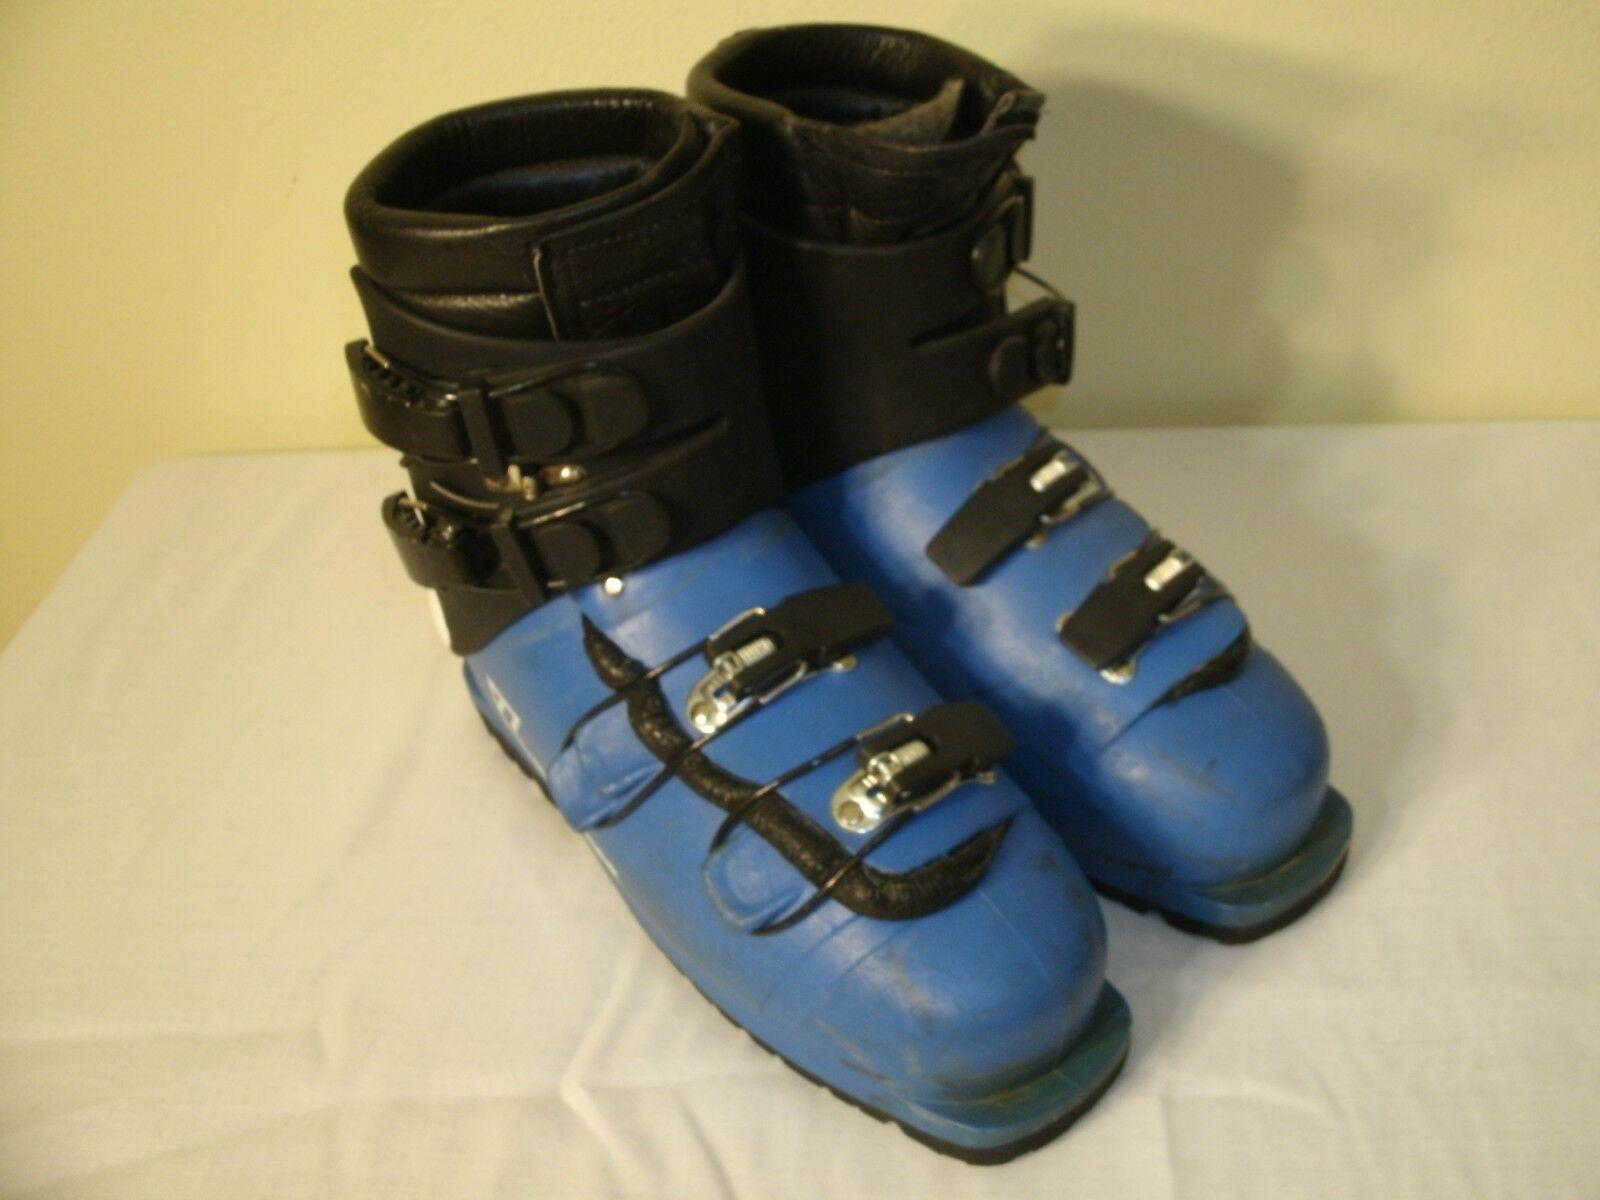 KASTINGER LESSNER ALPINE TOURING blueE SKI BOOTS U.S. SIZE 9  WOMEN'S  cheap